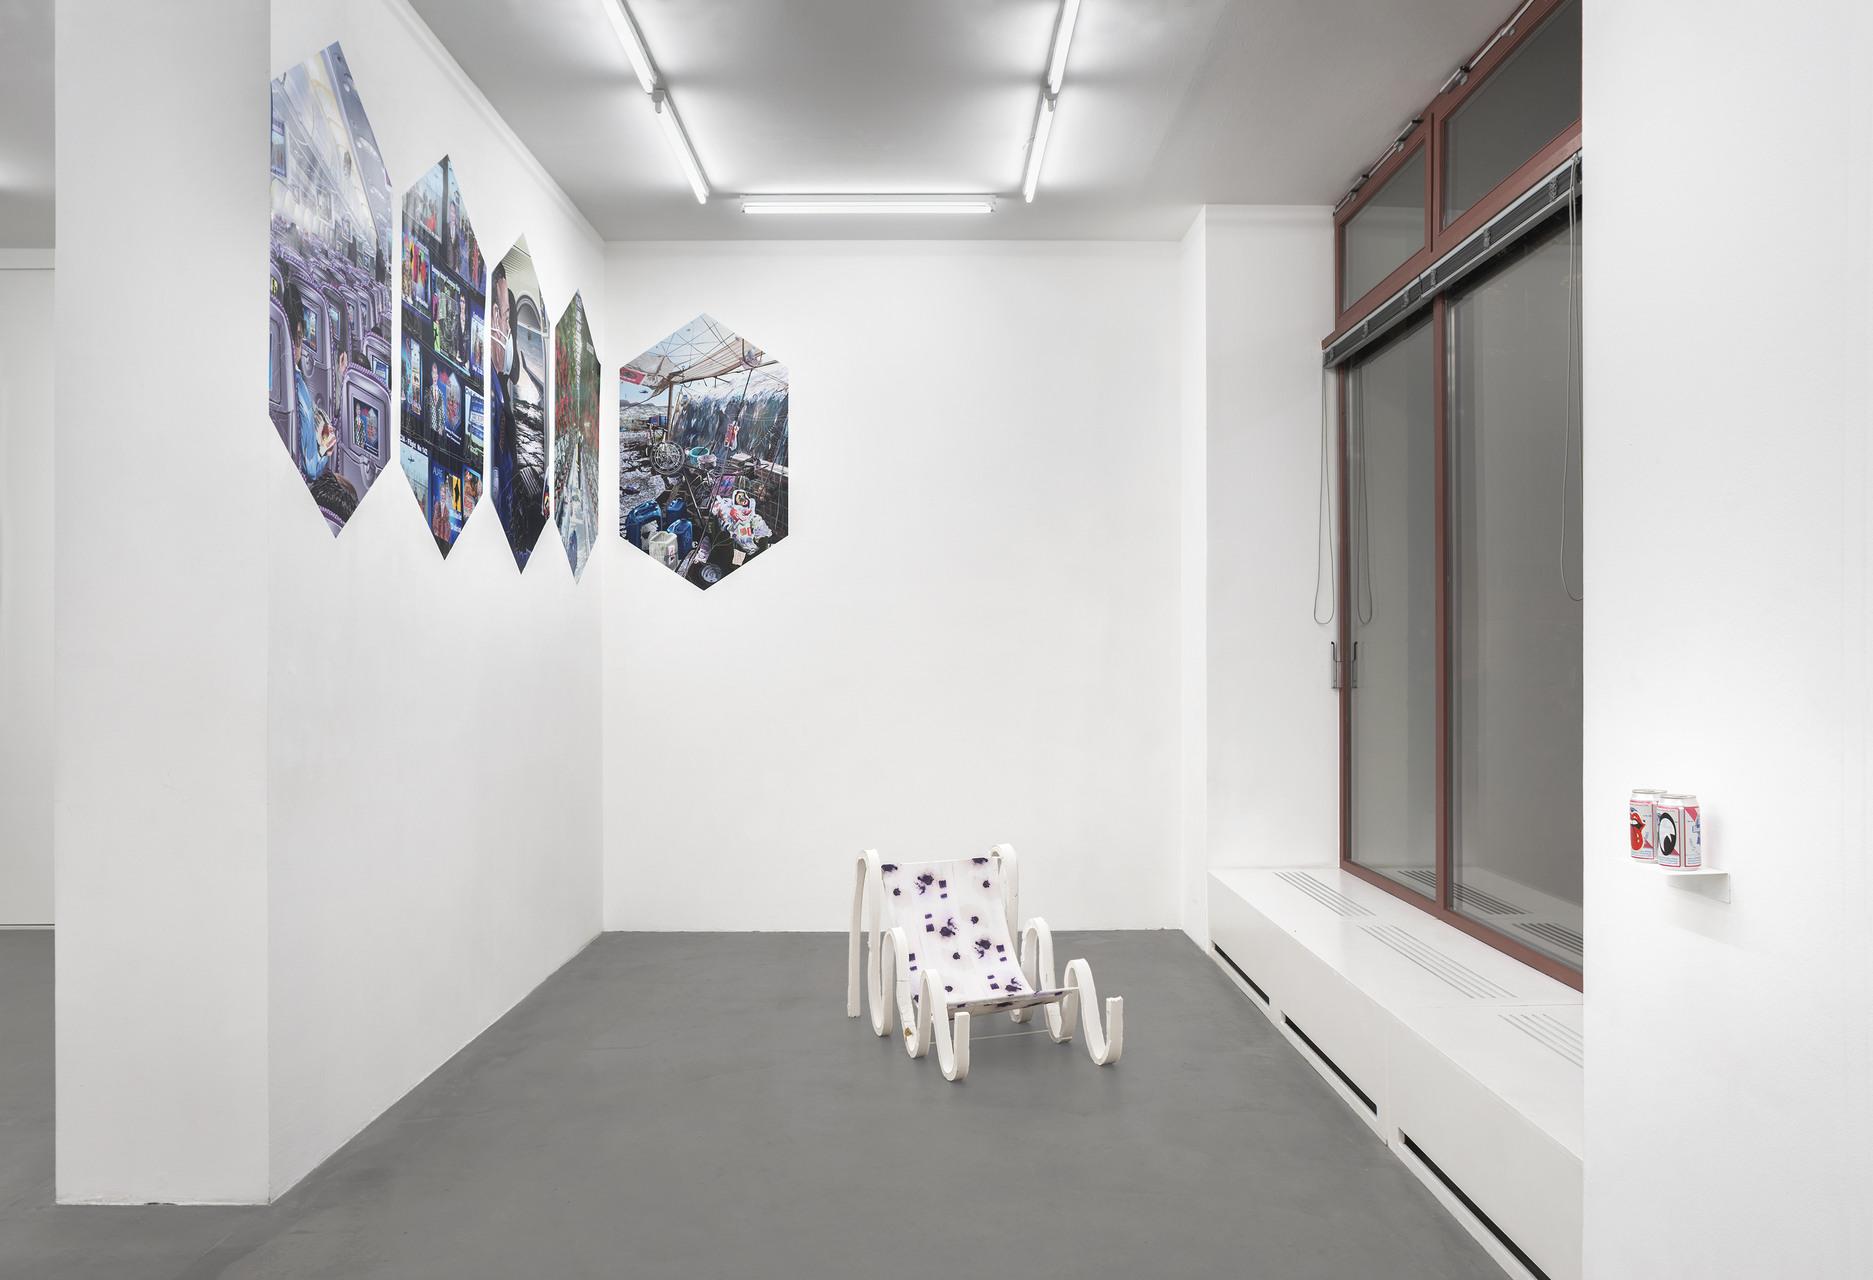 Hundstage_Installation views_2015_5